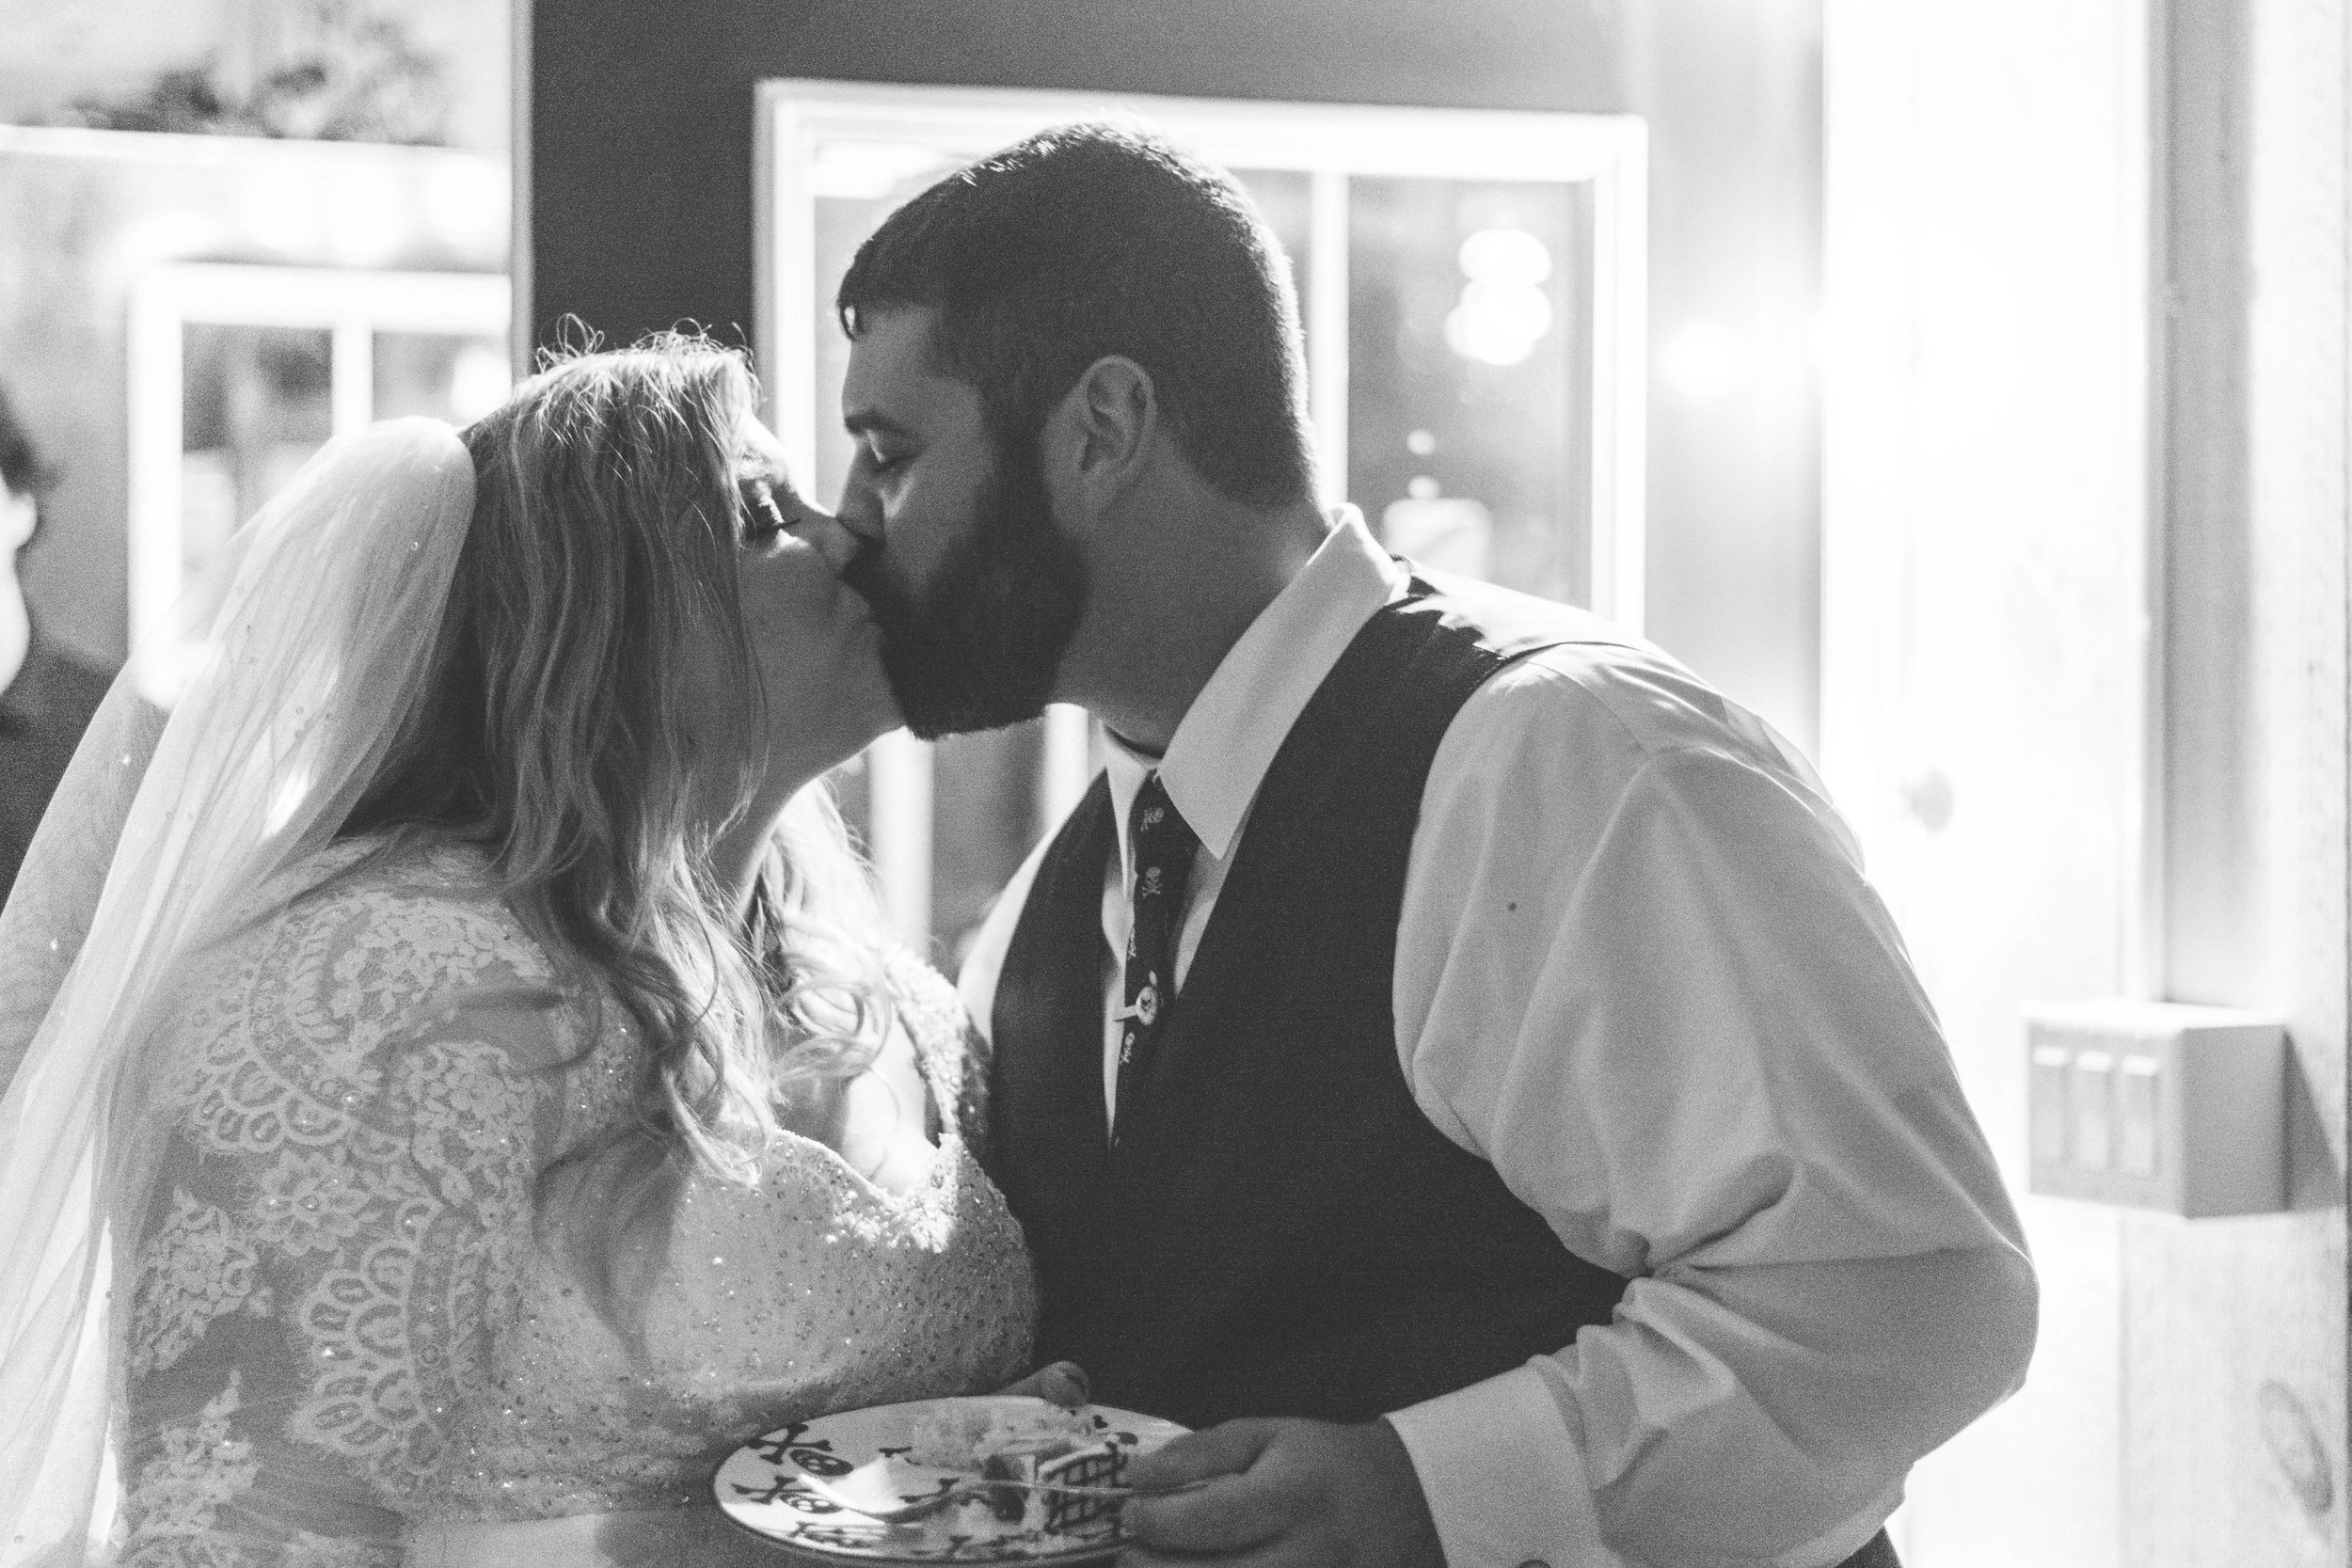 bride and groom cut cake photo